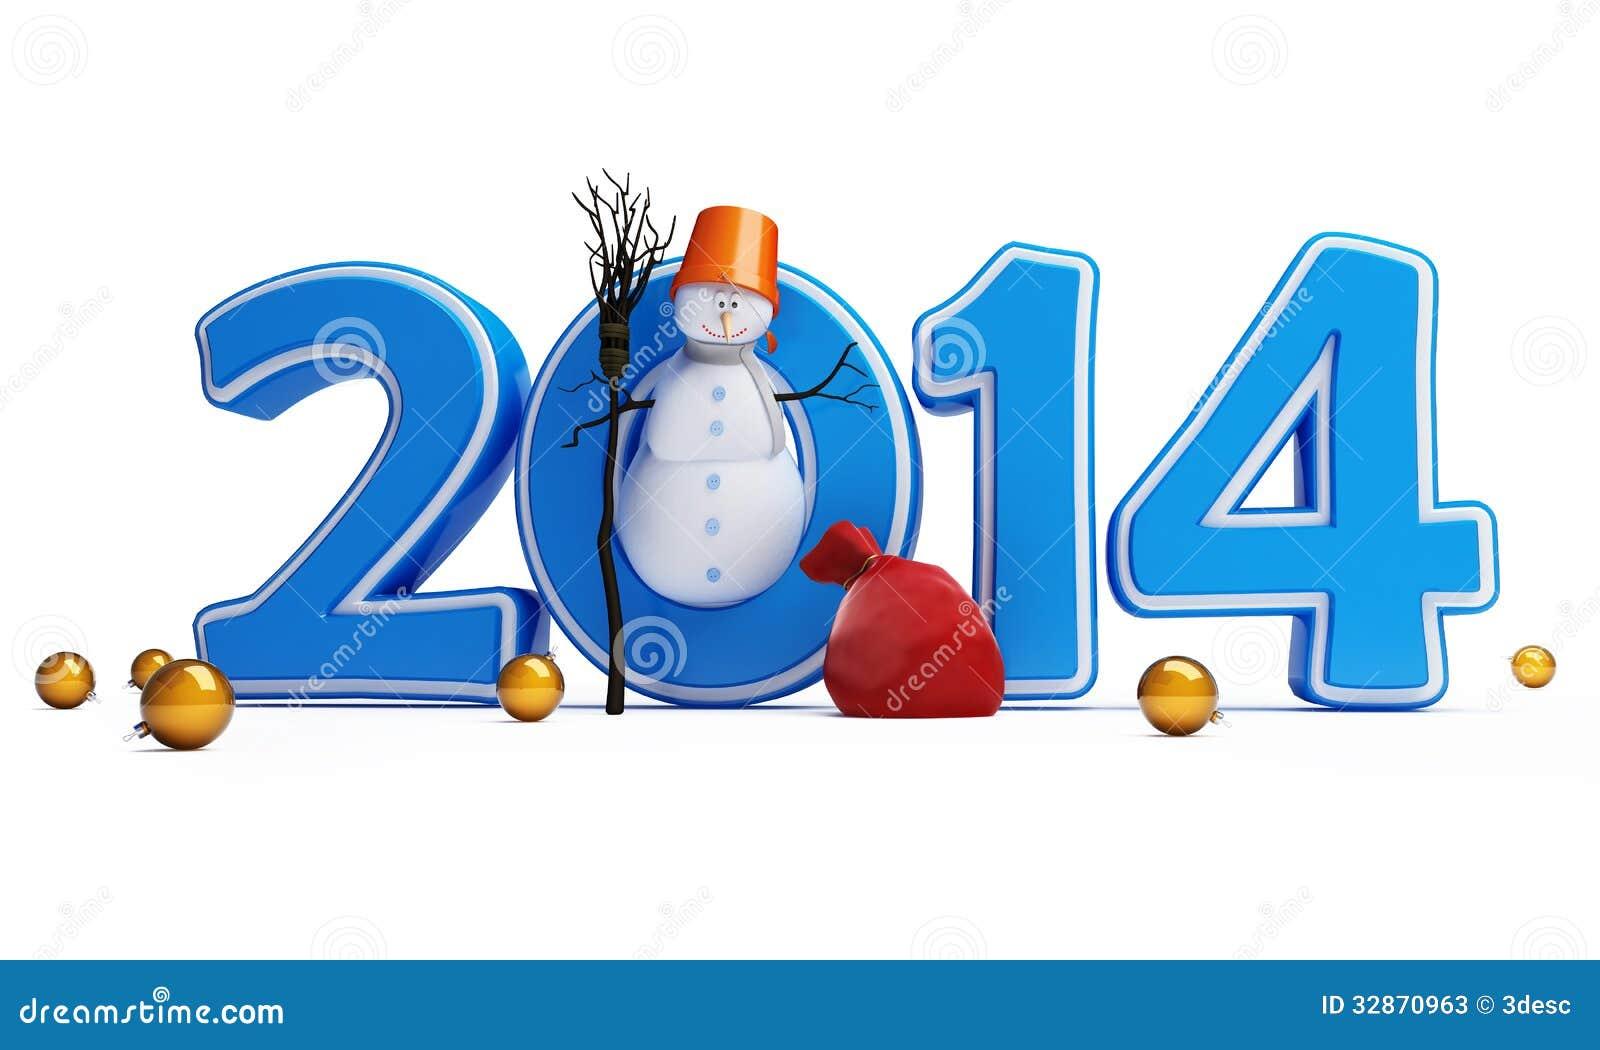 snowmen happy new year 2014 stock illustration illustration of